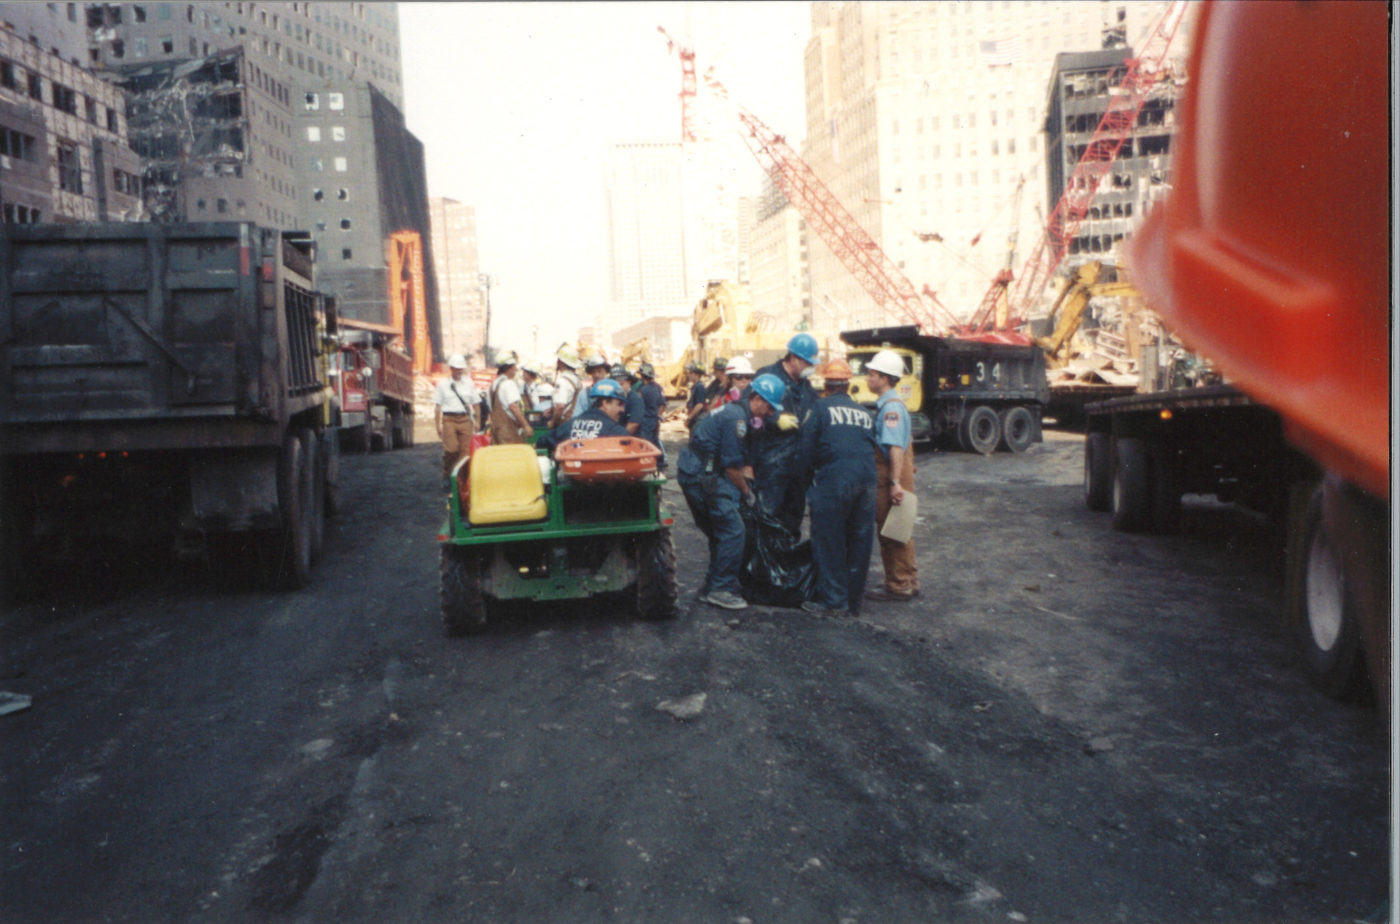 NYPD Crime Unit Working at Ground Zero